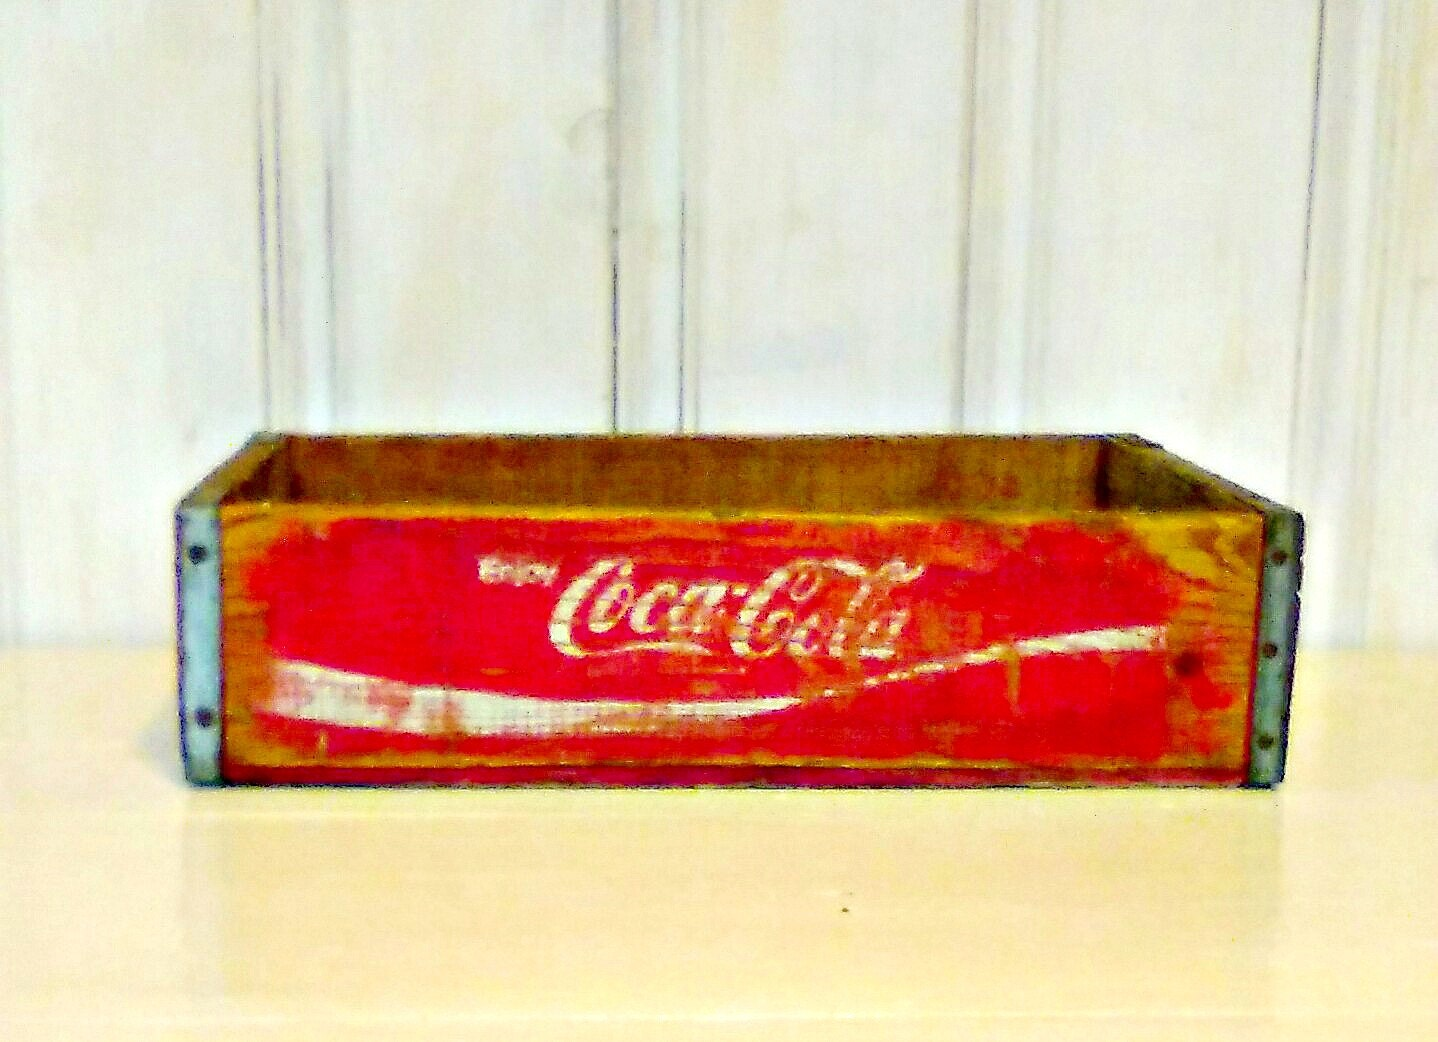 rouge coca cola en bois caisse coke boite par lindafrenchgallery. Black Bedroom Furniture Sets. Home Design Ideas